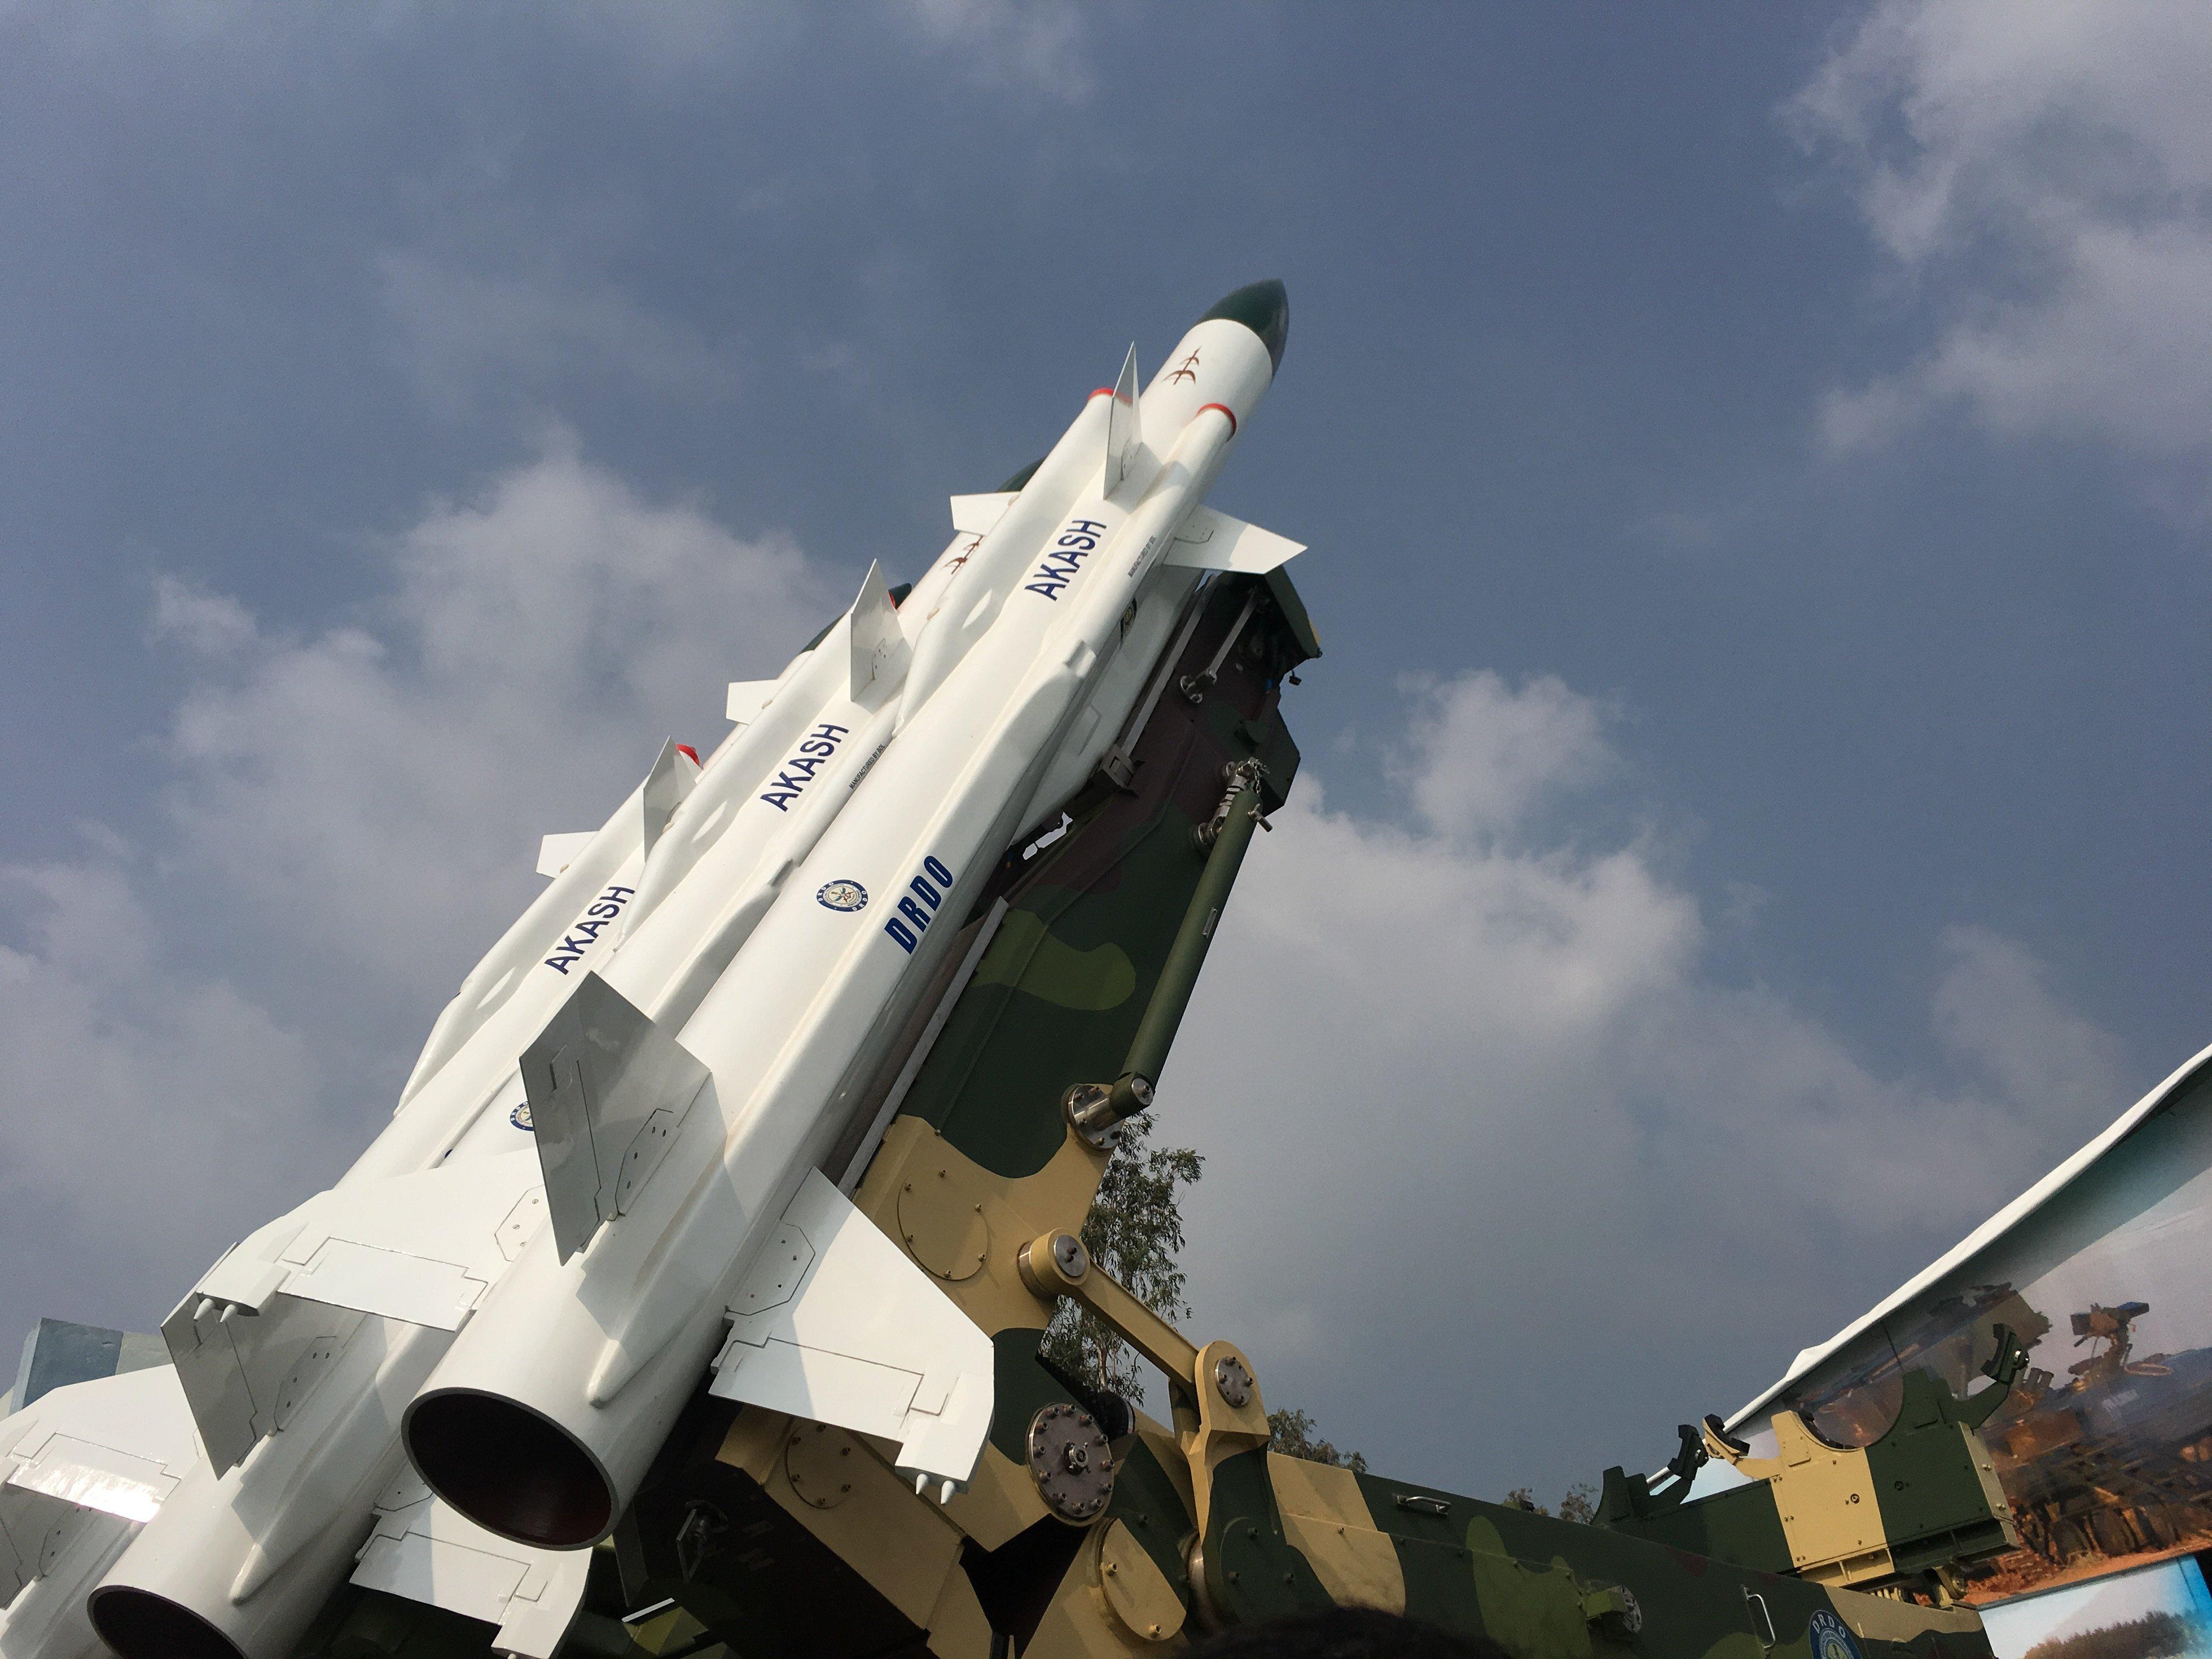 Akash_SAM_Missile_at_Defence_Expo